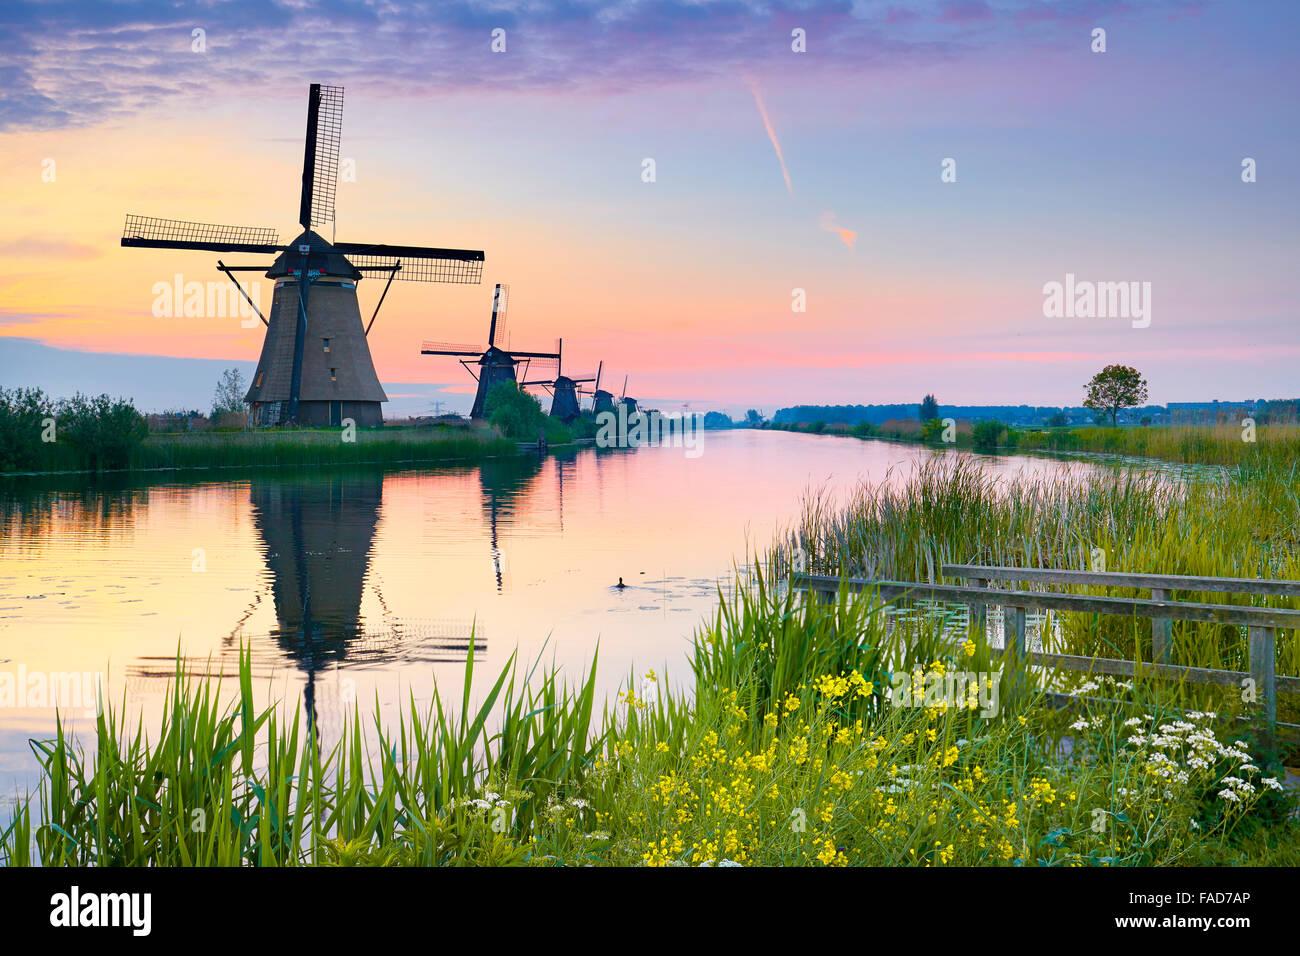 Netherlands windmill, Holland - Stock Image